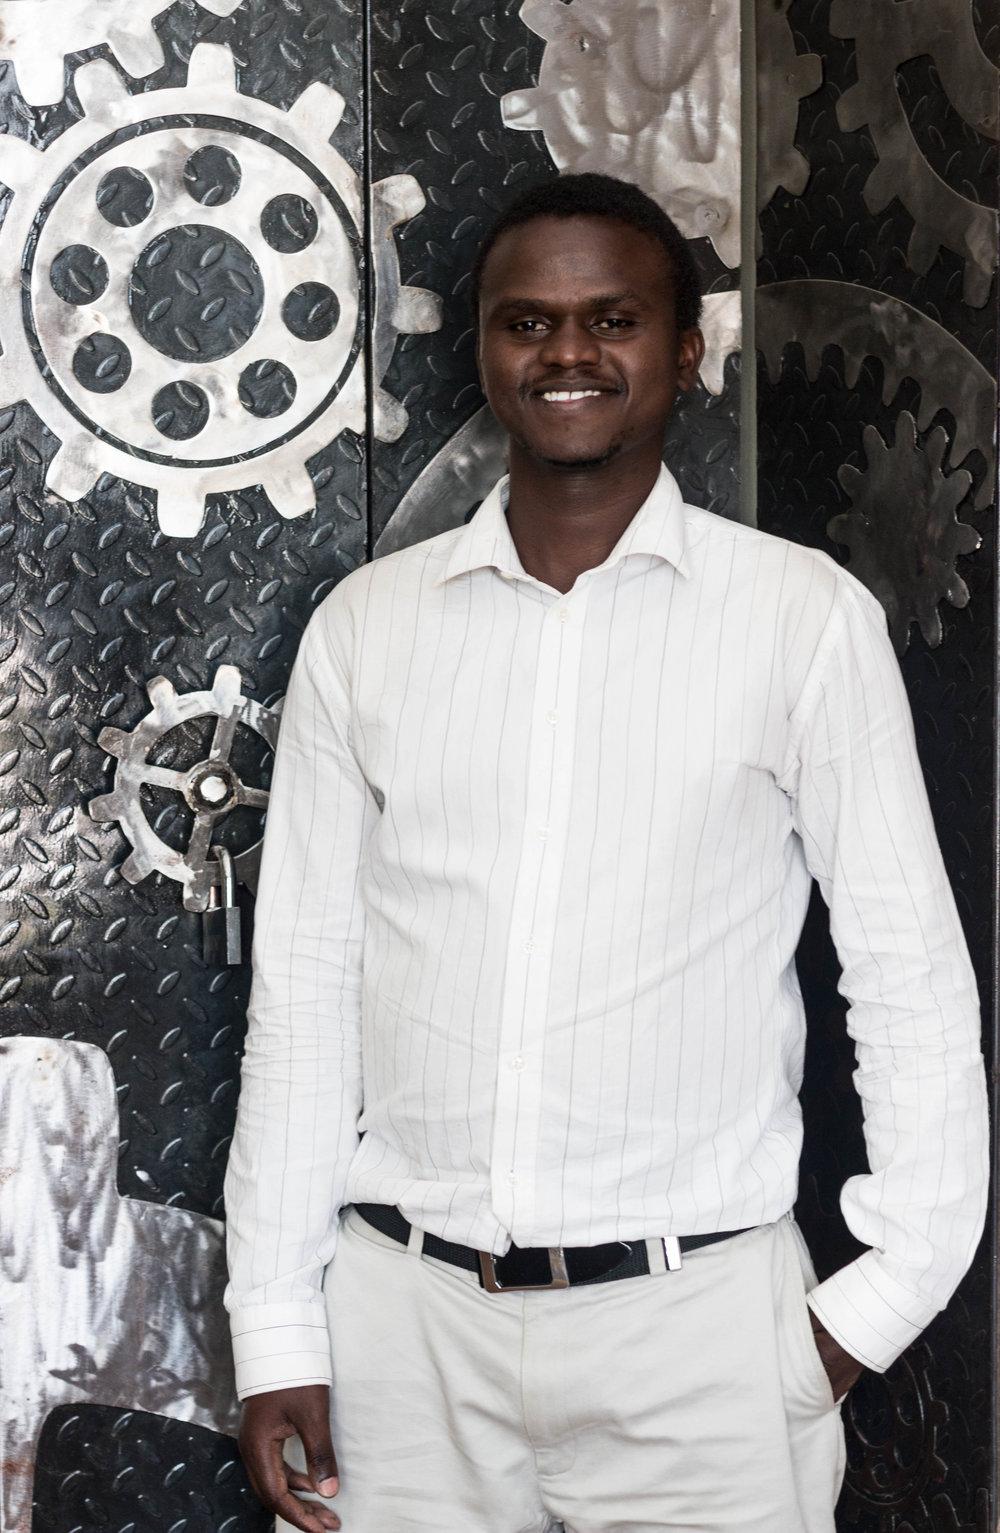 Mechanical engineer, Sato Bonface Kariuki